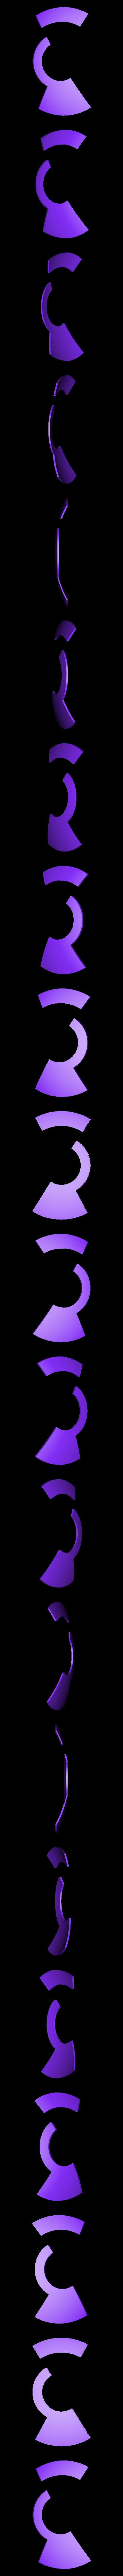 waike4.STL Download free STL file BB-8 • 3D printable template, 3DP_PARK